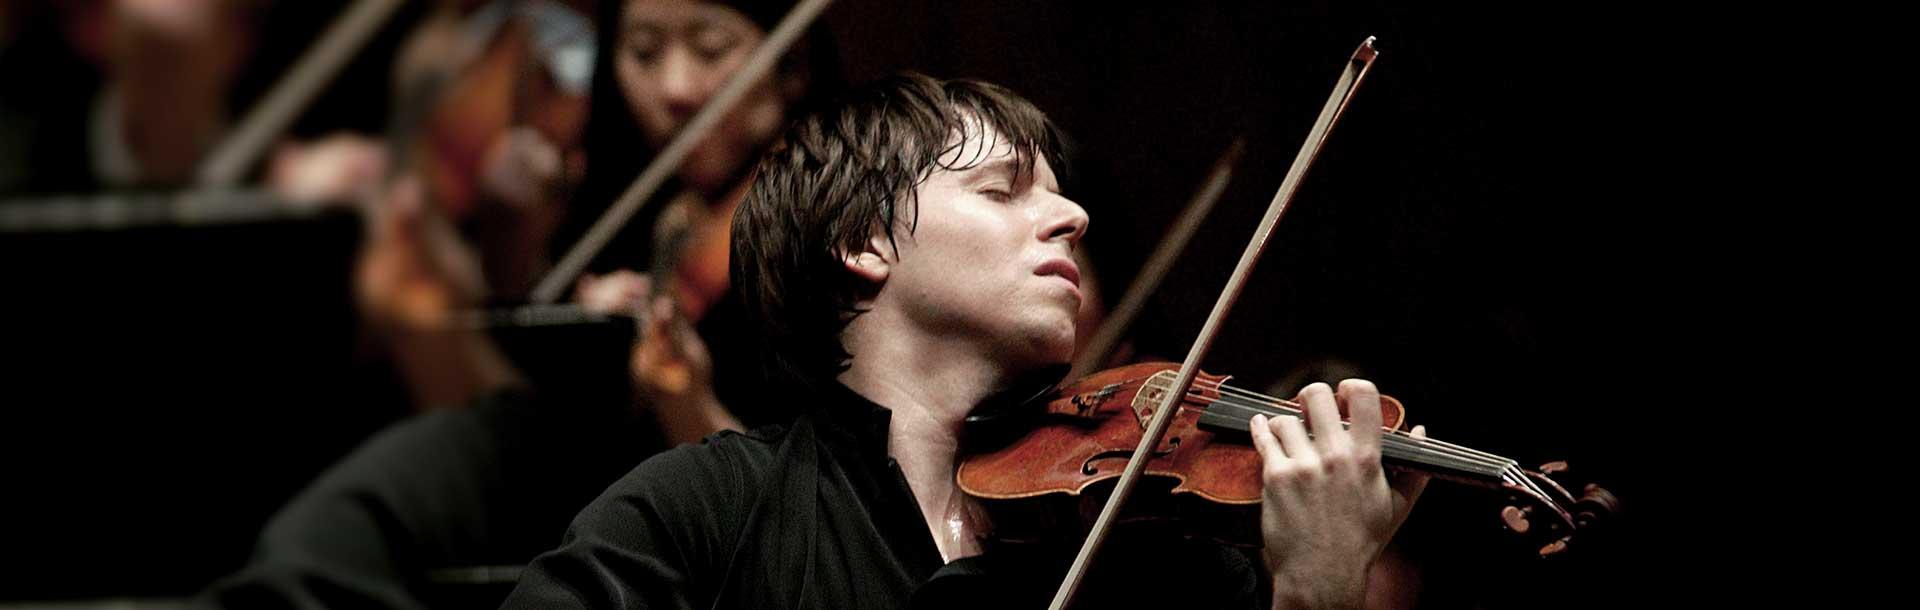 joshua_bell_osm_orchestre_symphonique_de_montreal_1920_610